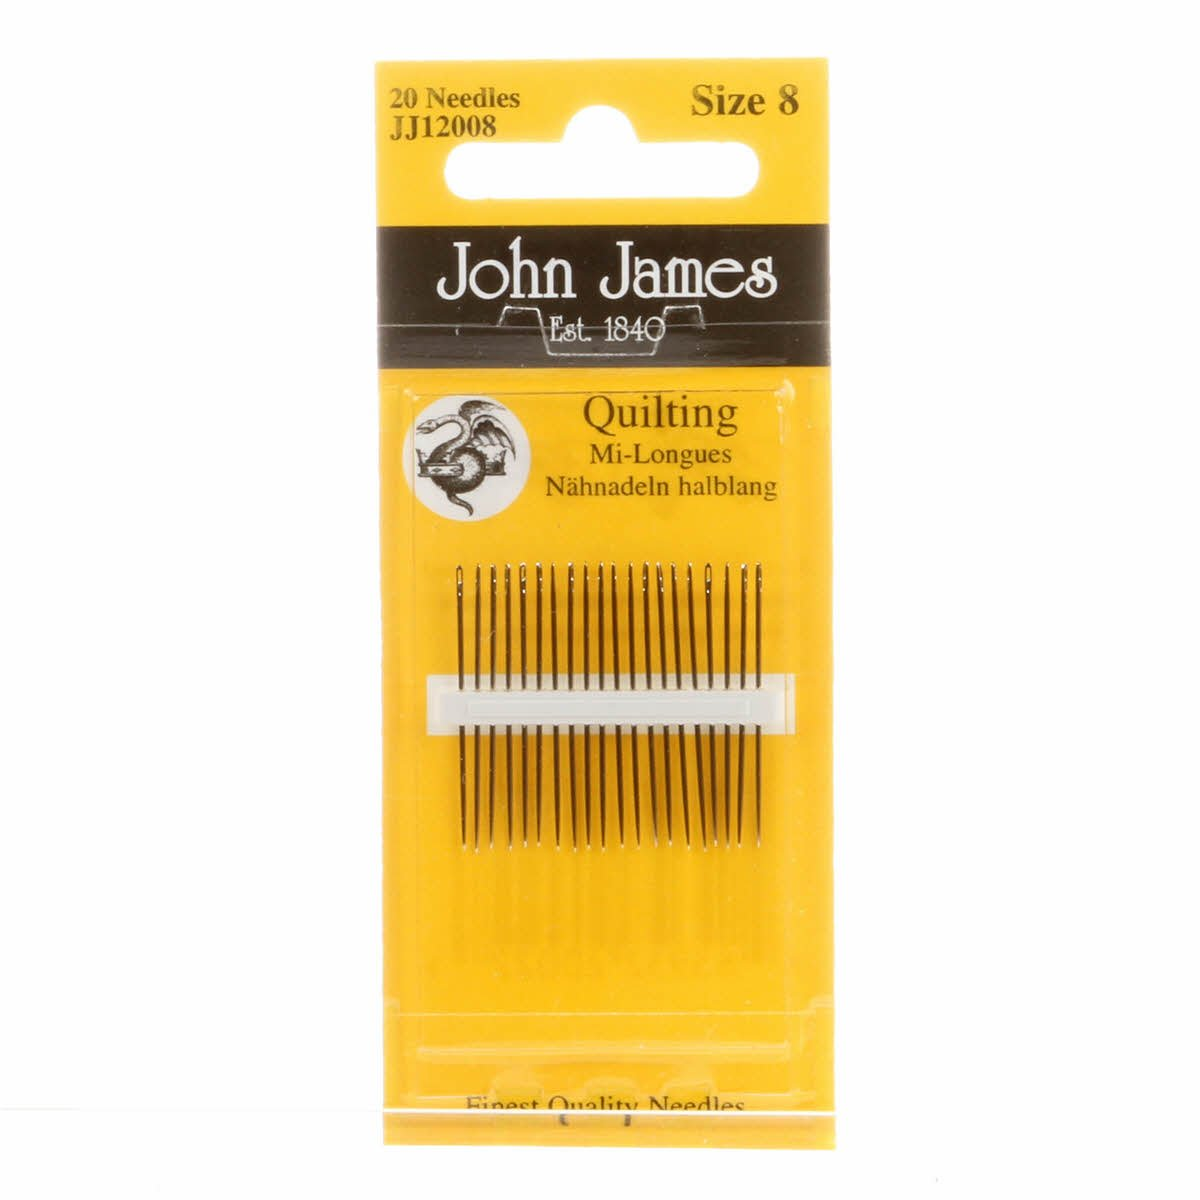 John James Quilting Needles Size 8 - 20 needles